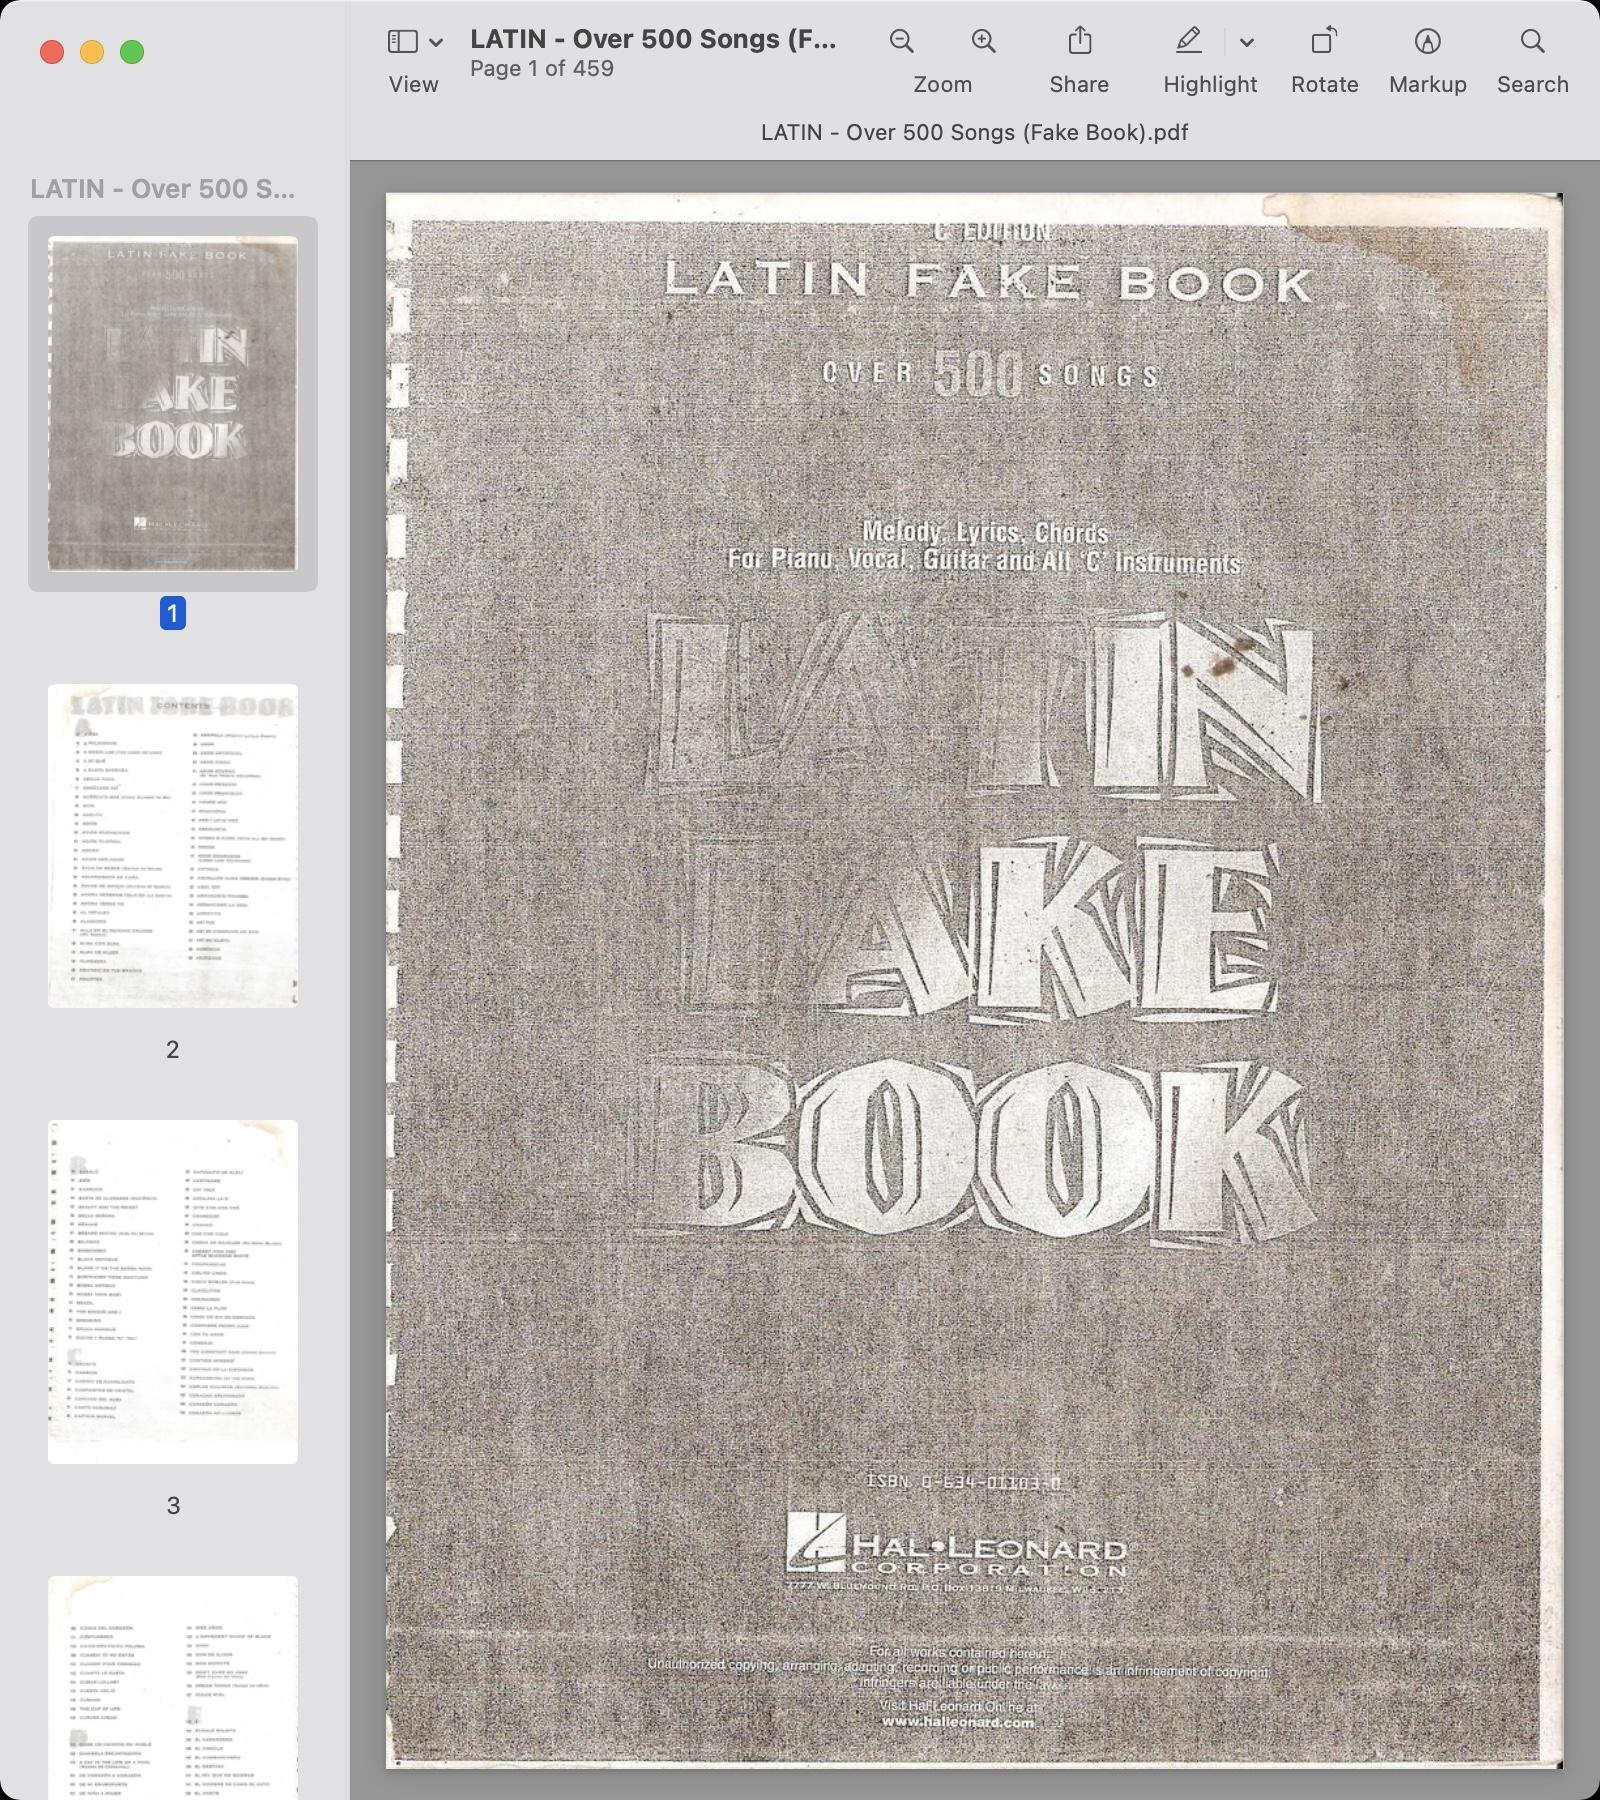 LATIN - Over 500 Songs (Fake Book).jpg